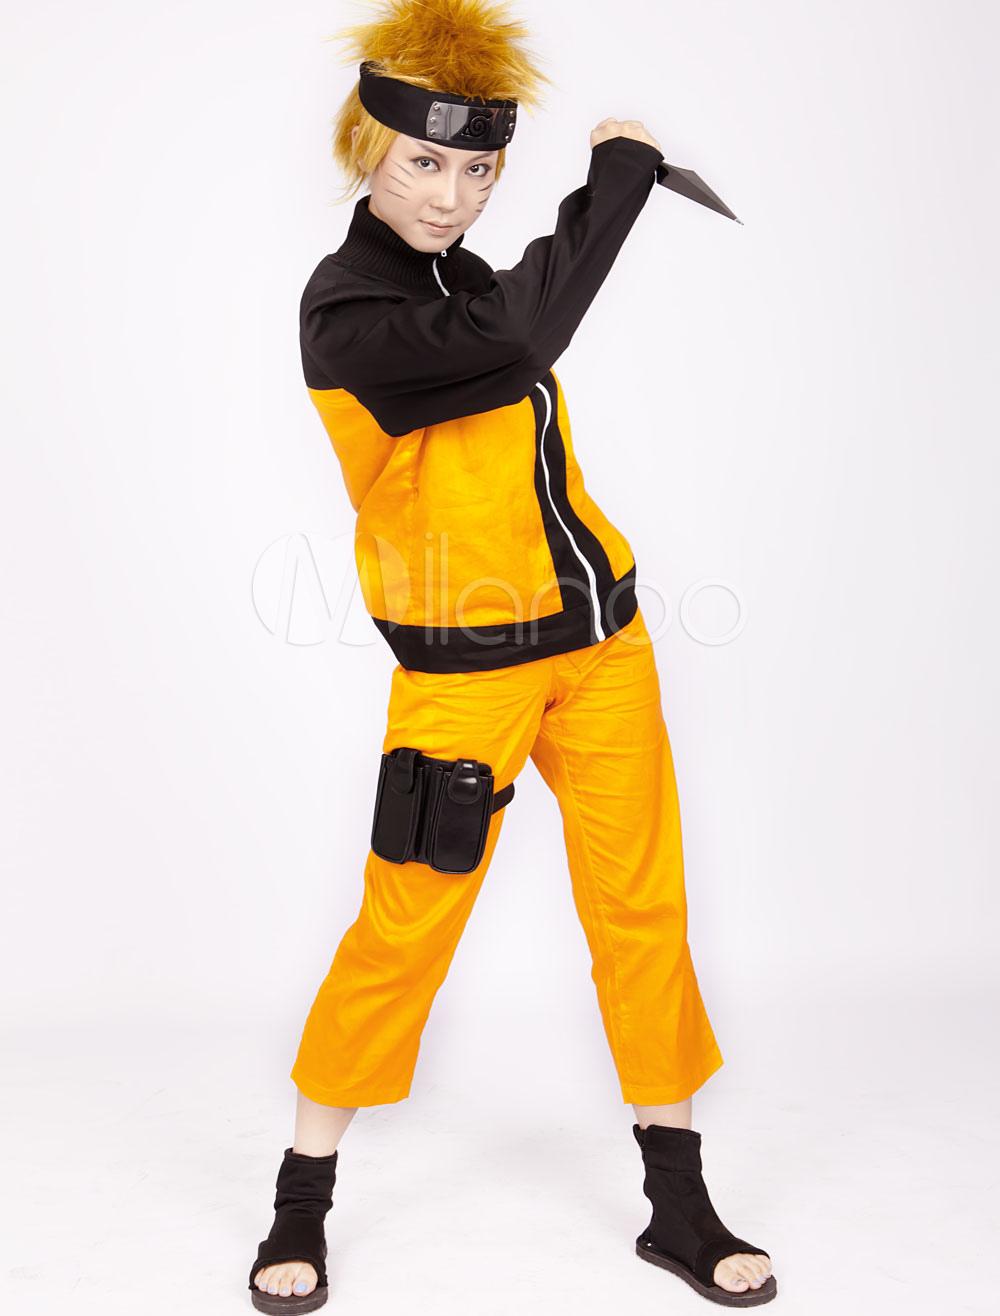 Halloween Anime Costumes adults fullset deadpool cosplay costume Anime Naruto Shippuden Uzumaki Naruto Halloween Cosplay Costume Milanoocom